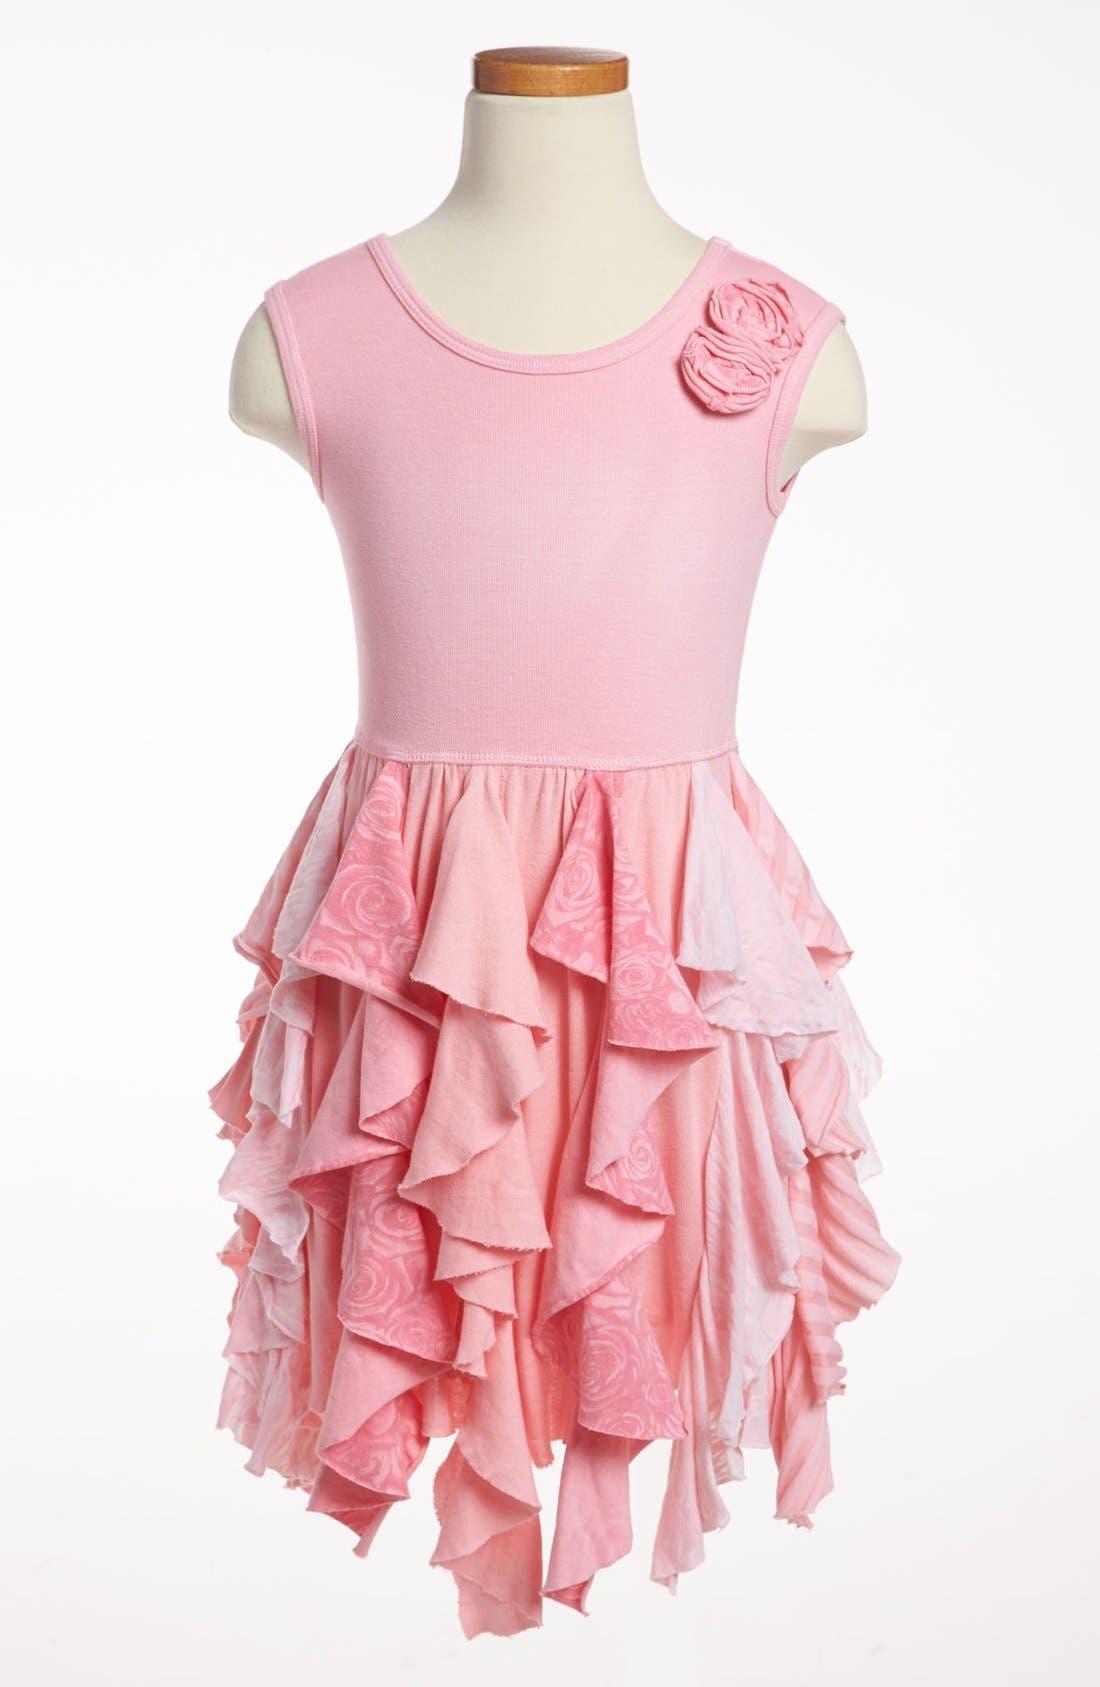 Alternate Image 1 Selected - Mignone Ruffle Skirt Dress (Little Girls & Big Girls)